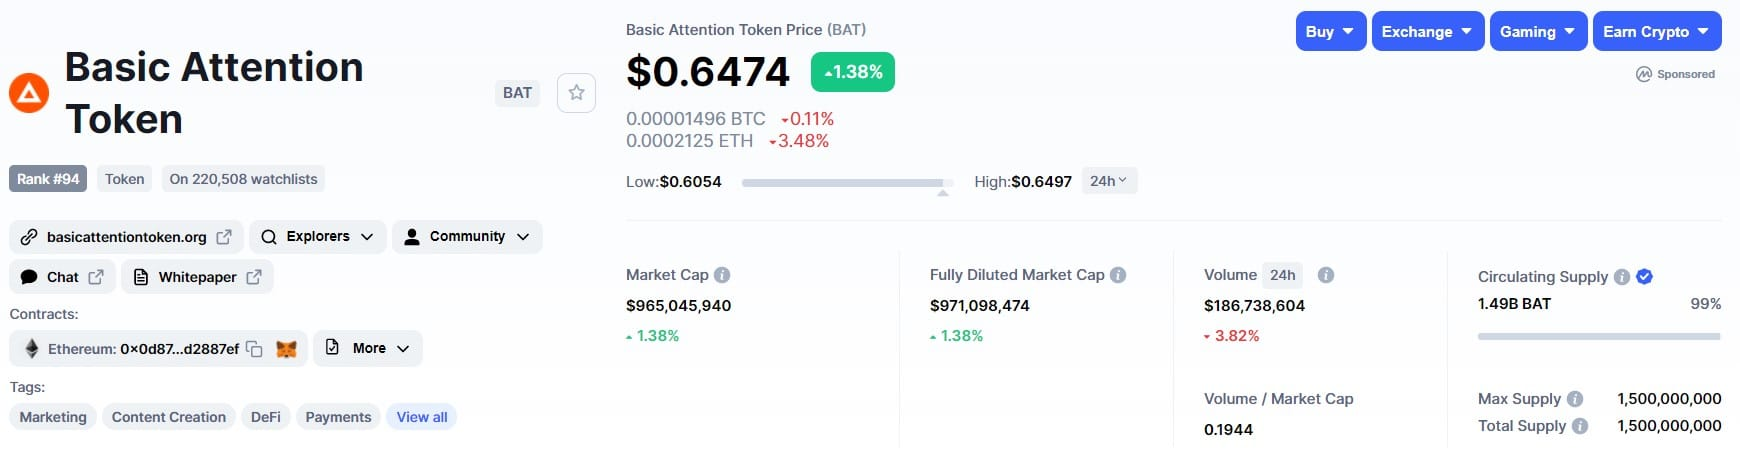 invest in basic attention token etoro